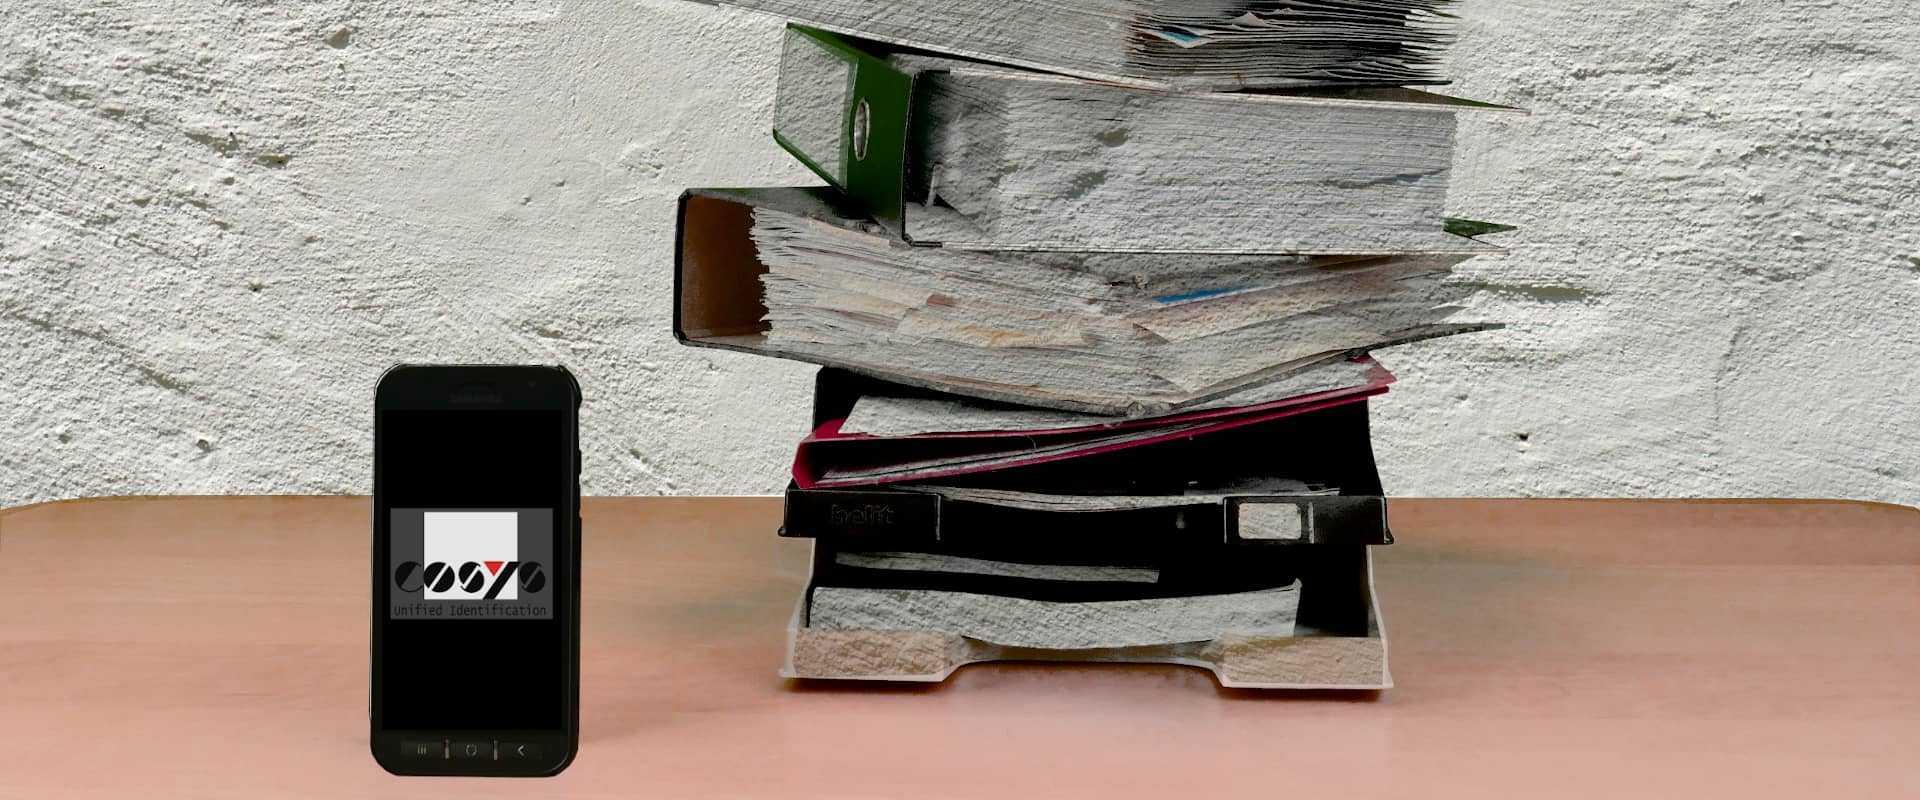 Digitale Scanner Inventur statt Bürokratie